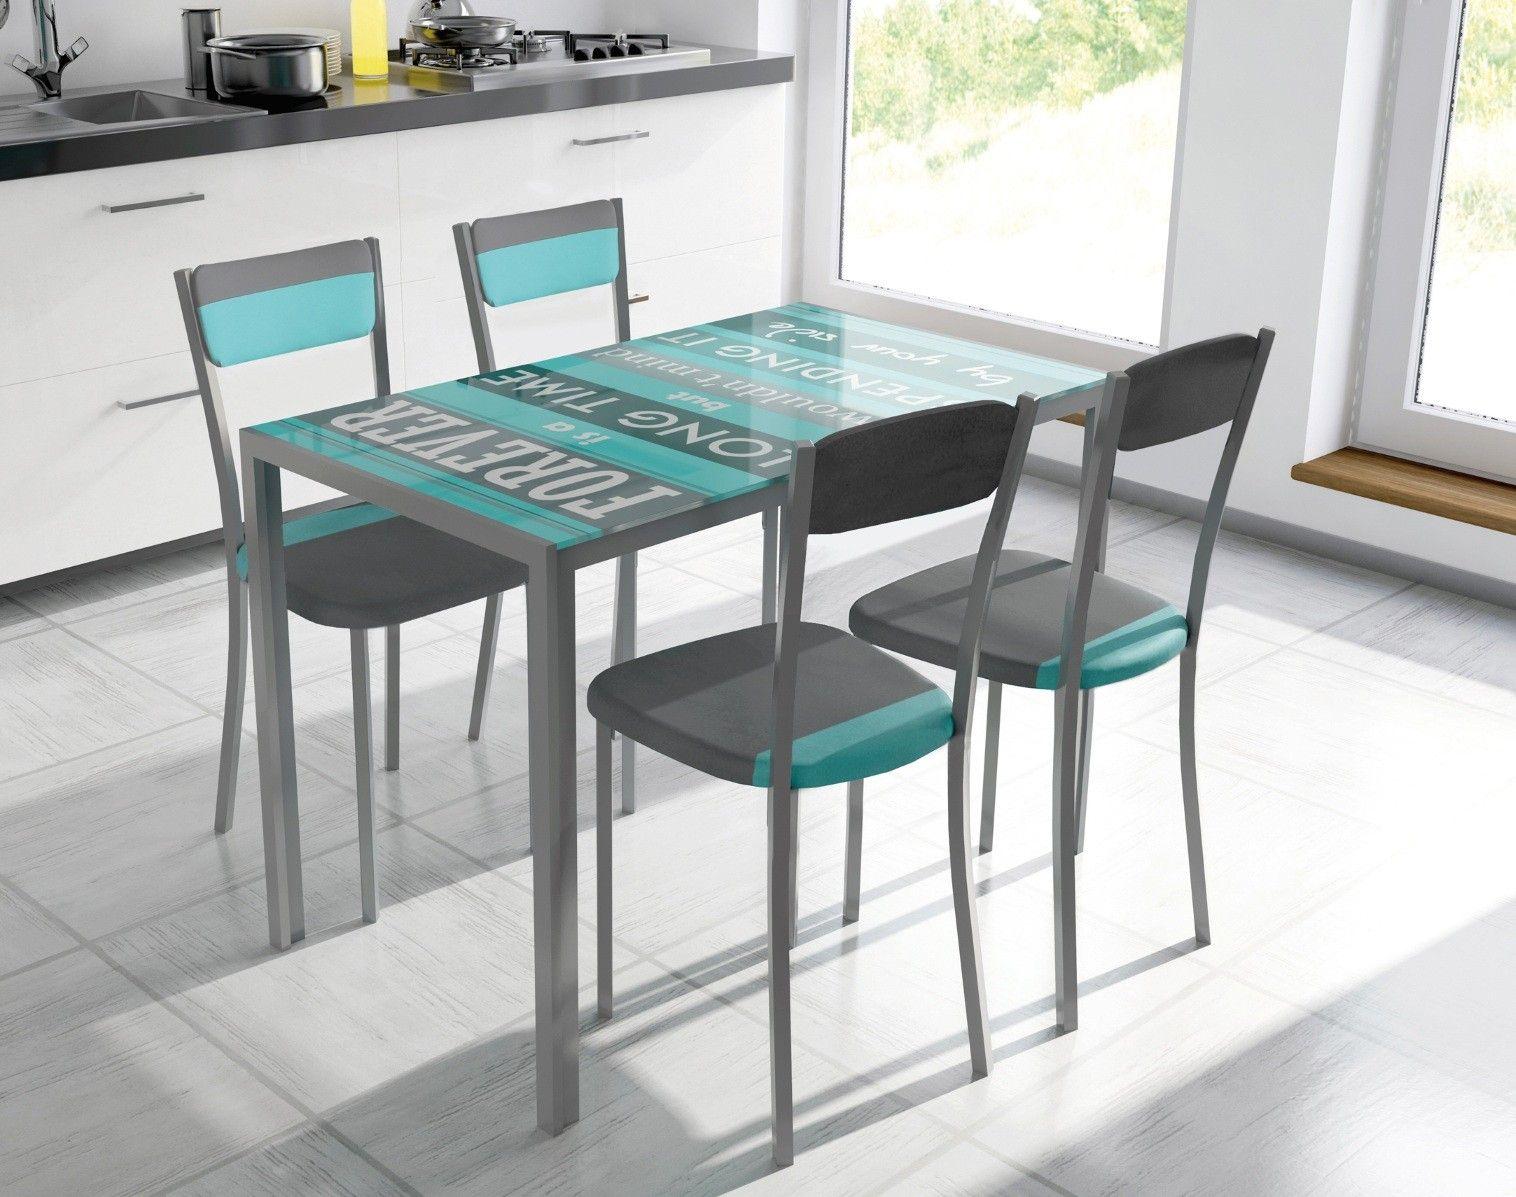 Conjunto de mesa metálica, con tapa de cristal con dibujo impreso ...